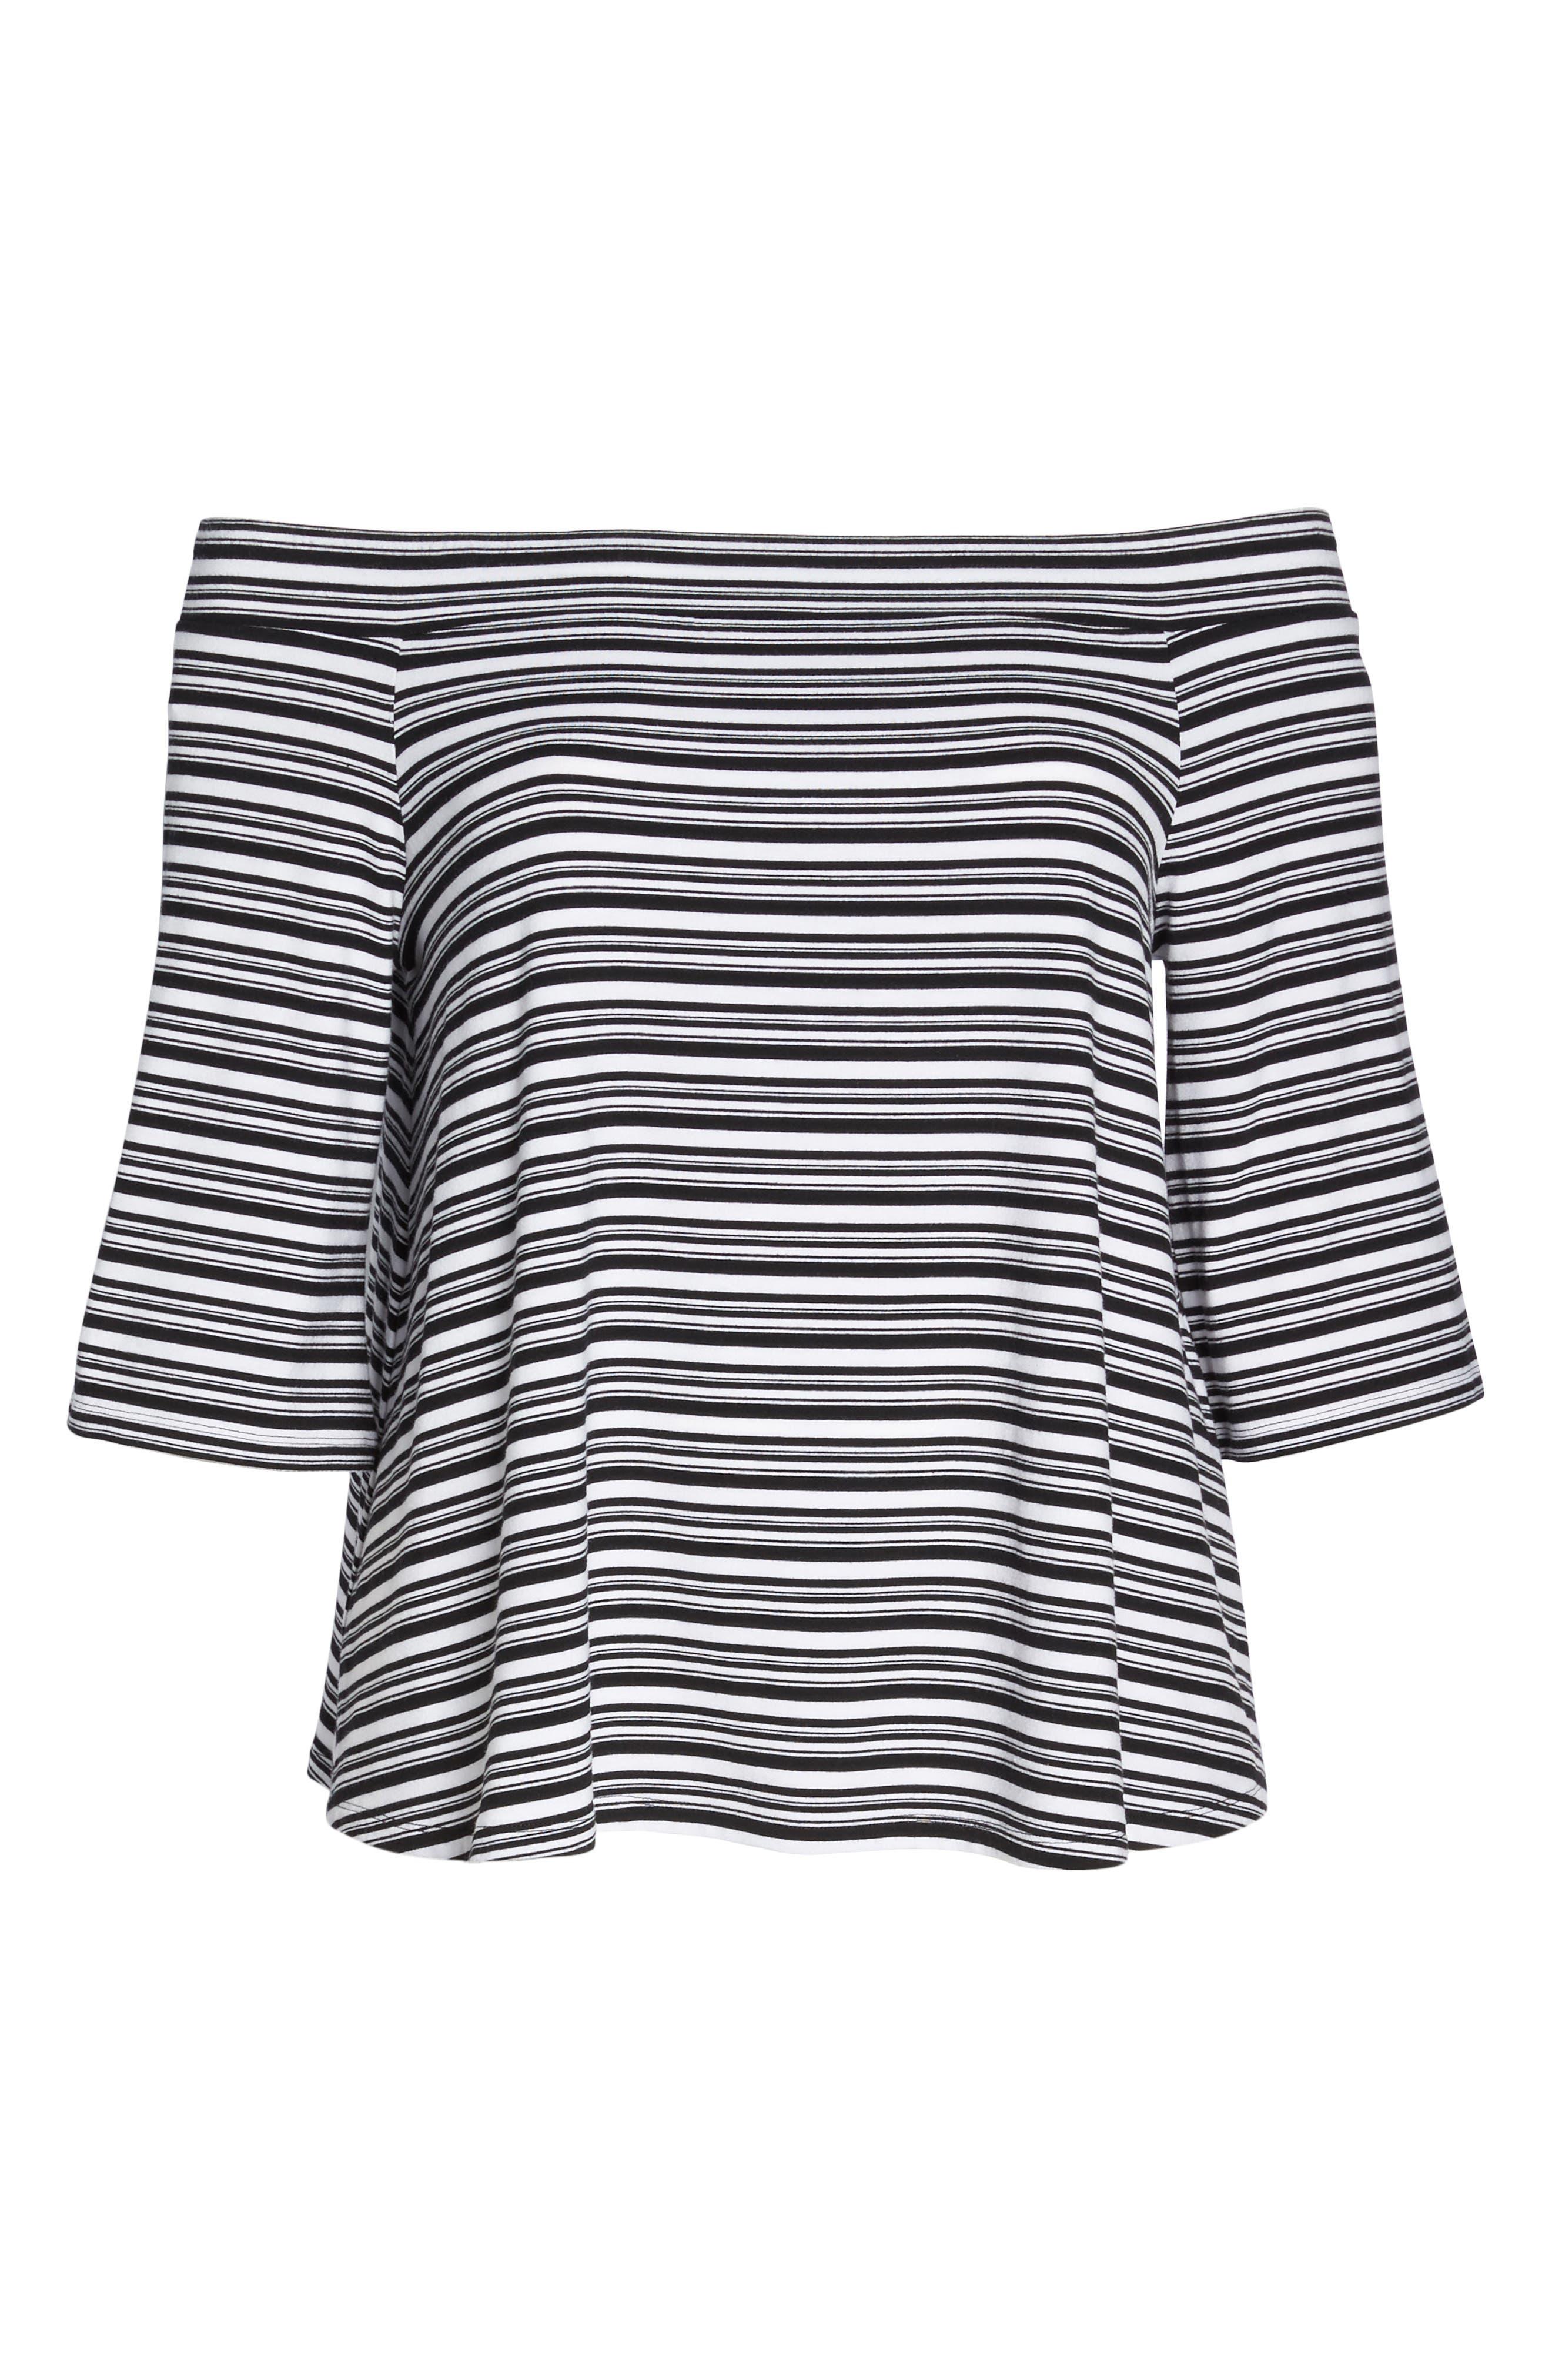 Stripe Off the Shoulder Top,                             Alternate thumbnail 6, color,                             Black- White Veriegated Stripe